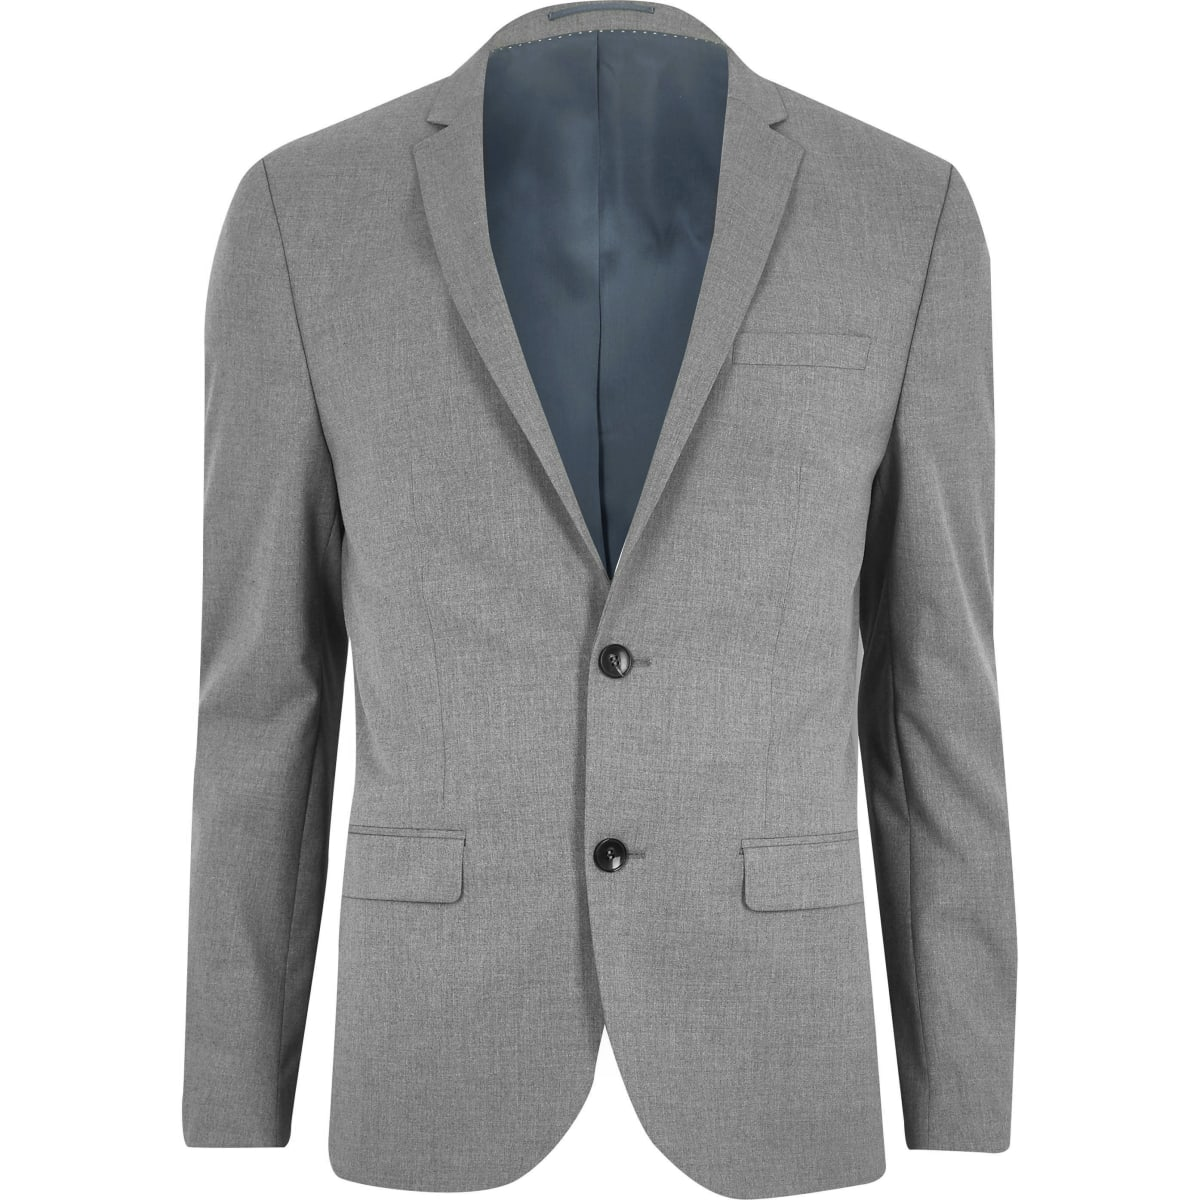 Light grey skinny fit suit jacket